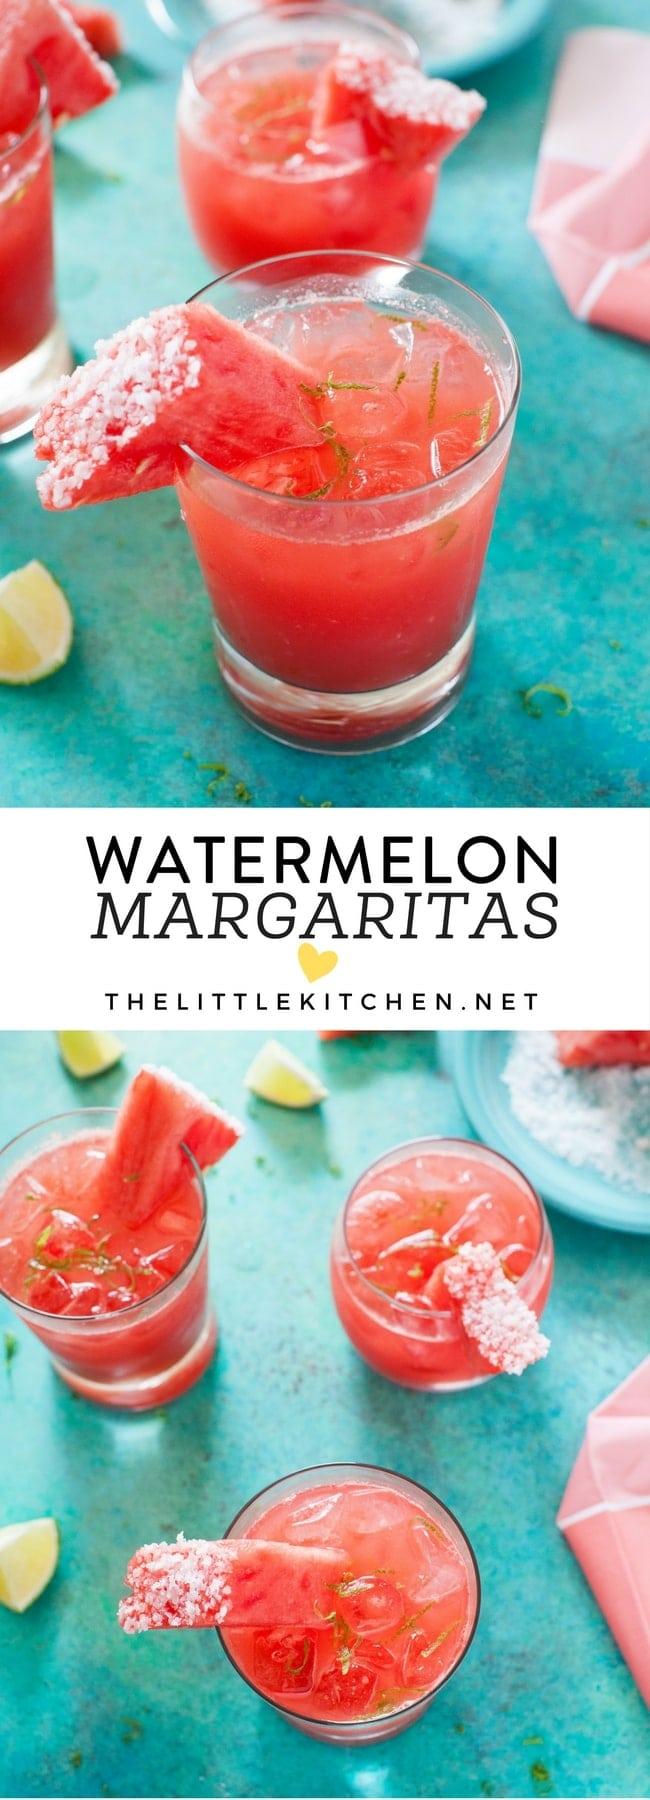 Watermelon Margaritas from thelittlekitchen.net